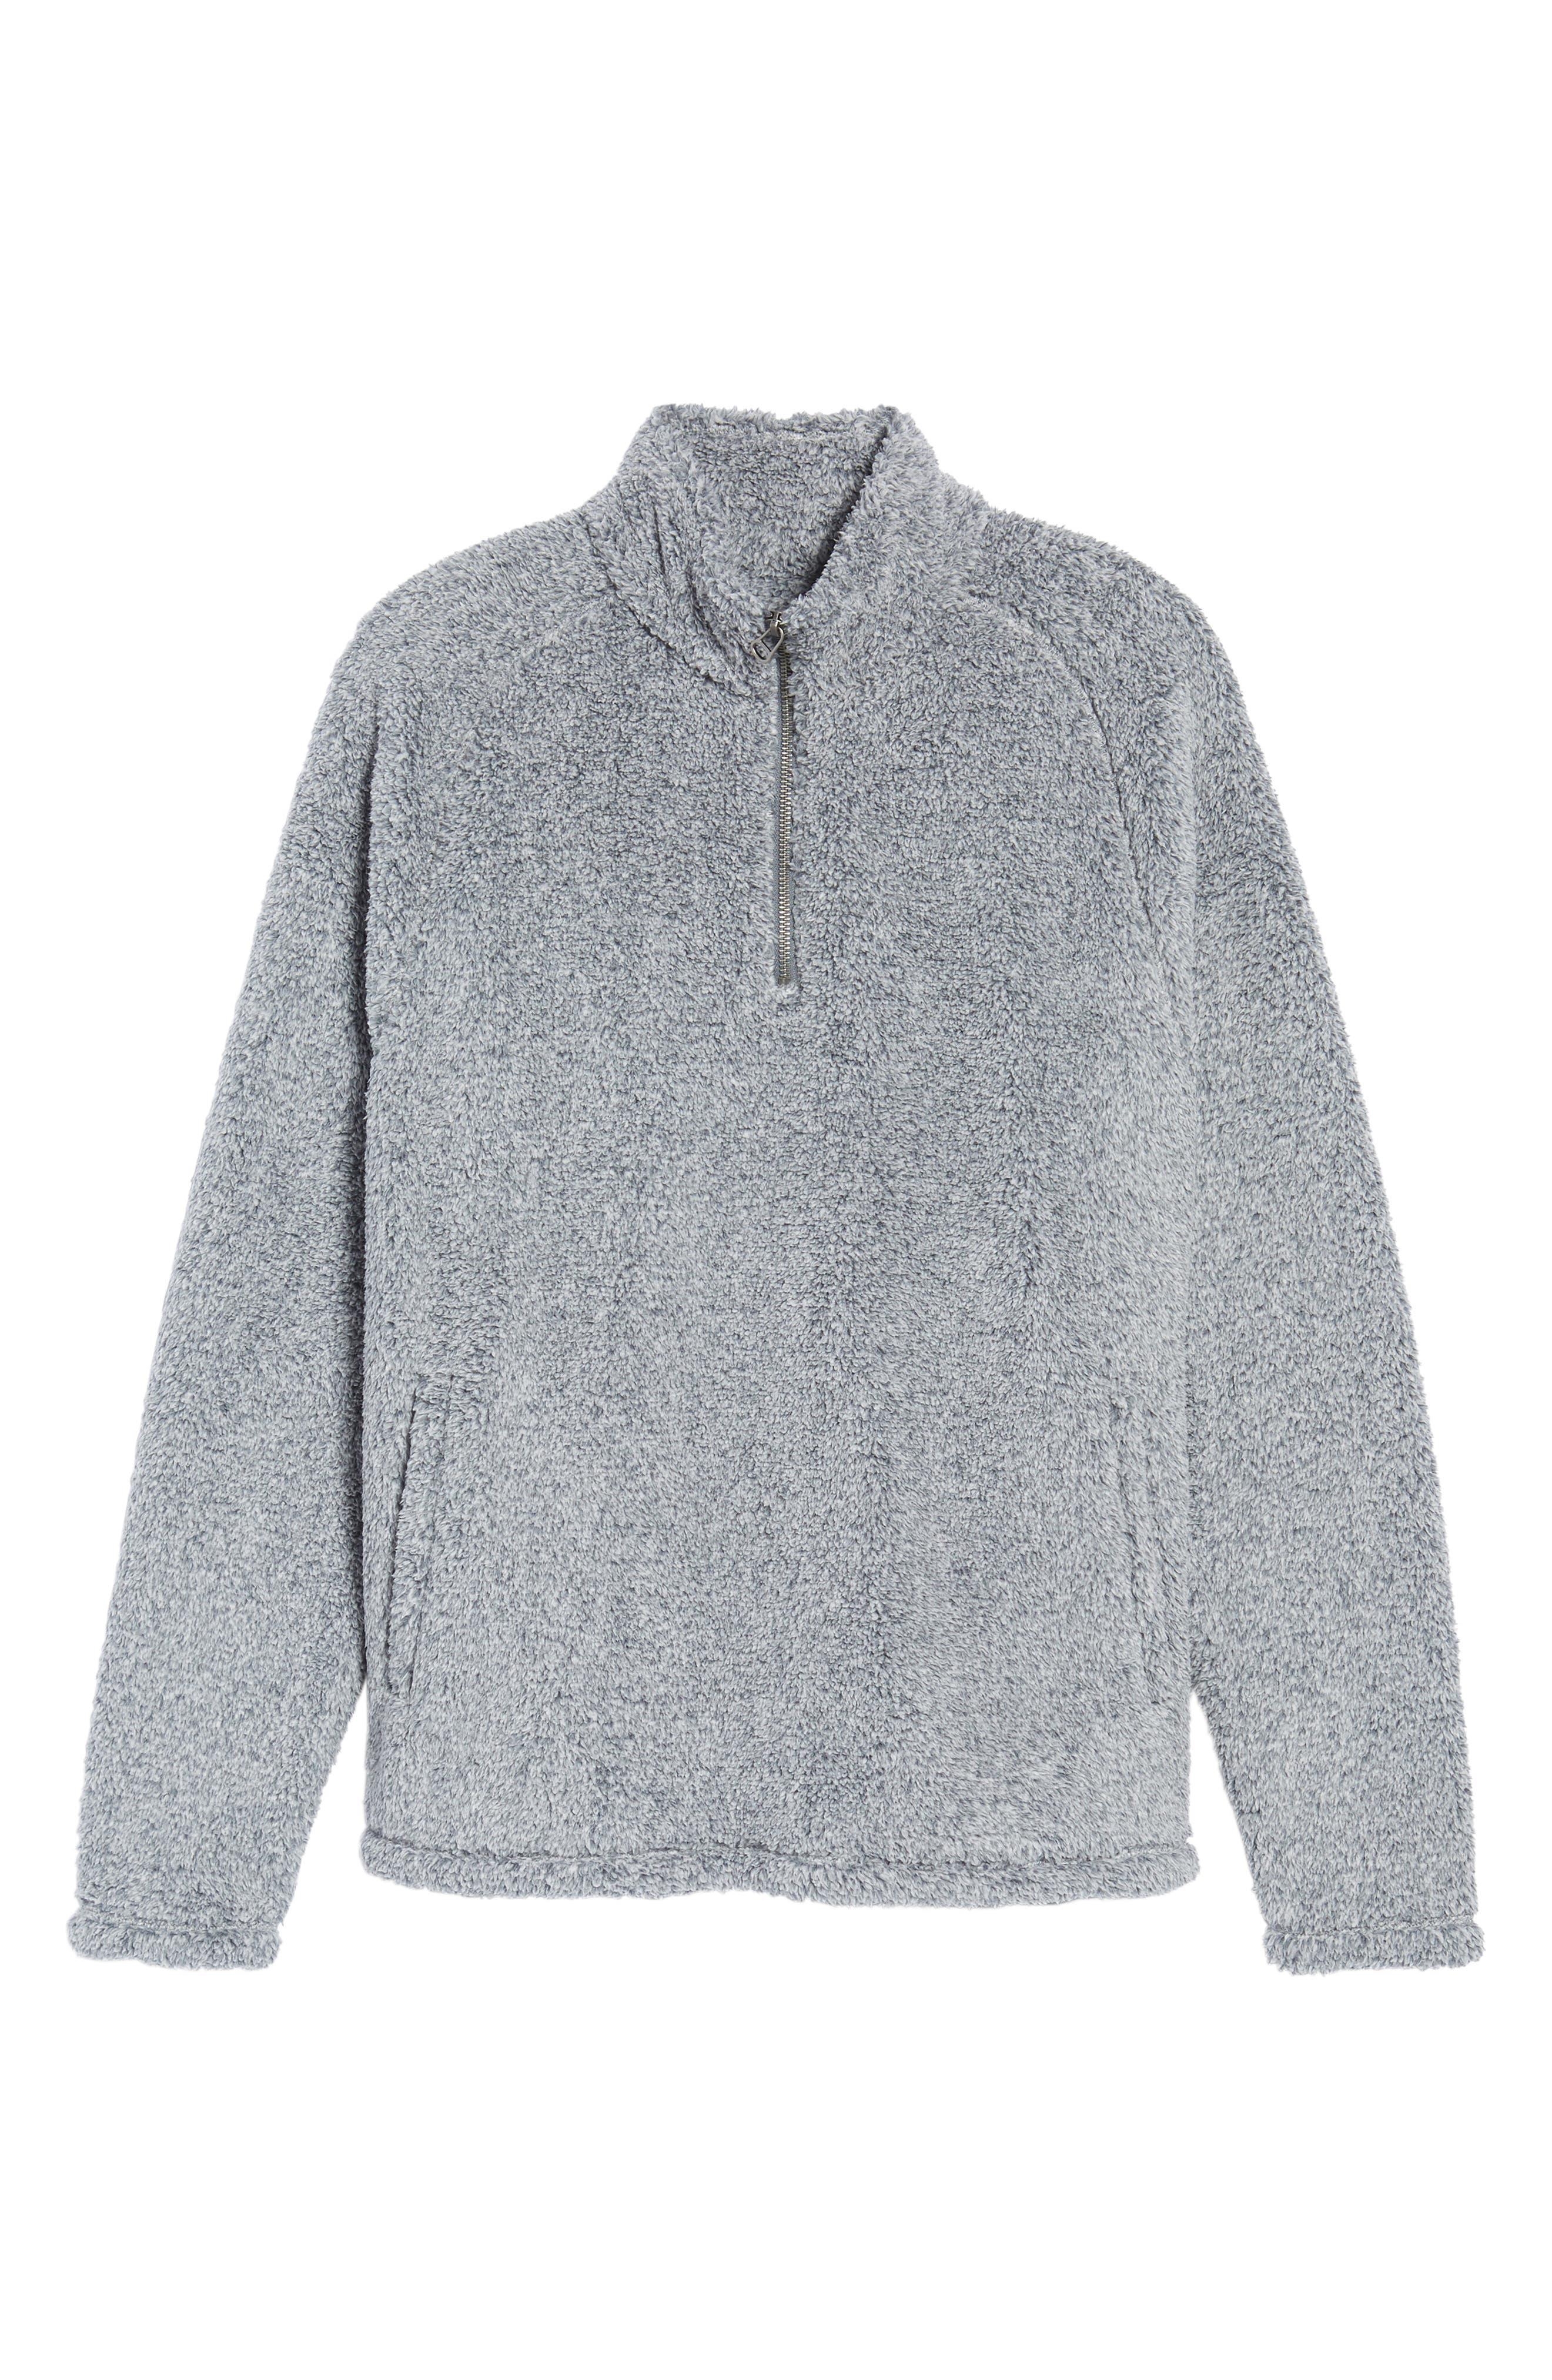 Polar Fleece Quarter Zip Pullover,                             Alternate thumbnail 6, color,                             Black Caviar Heather